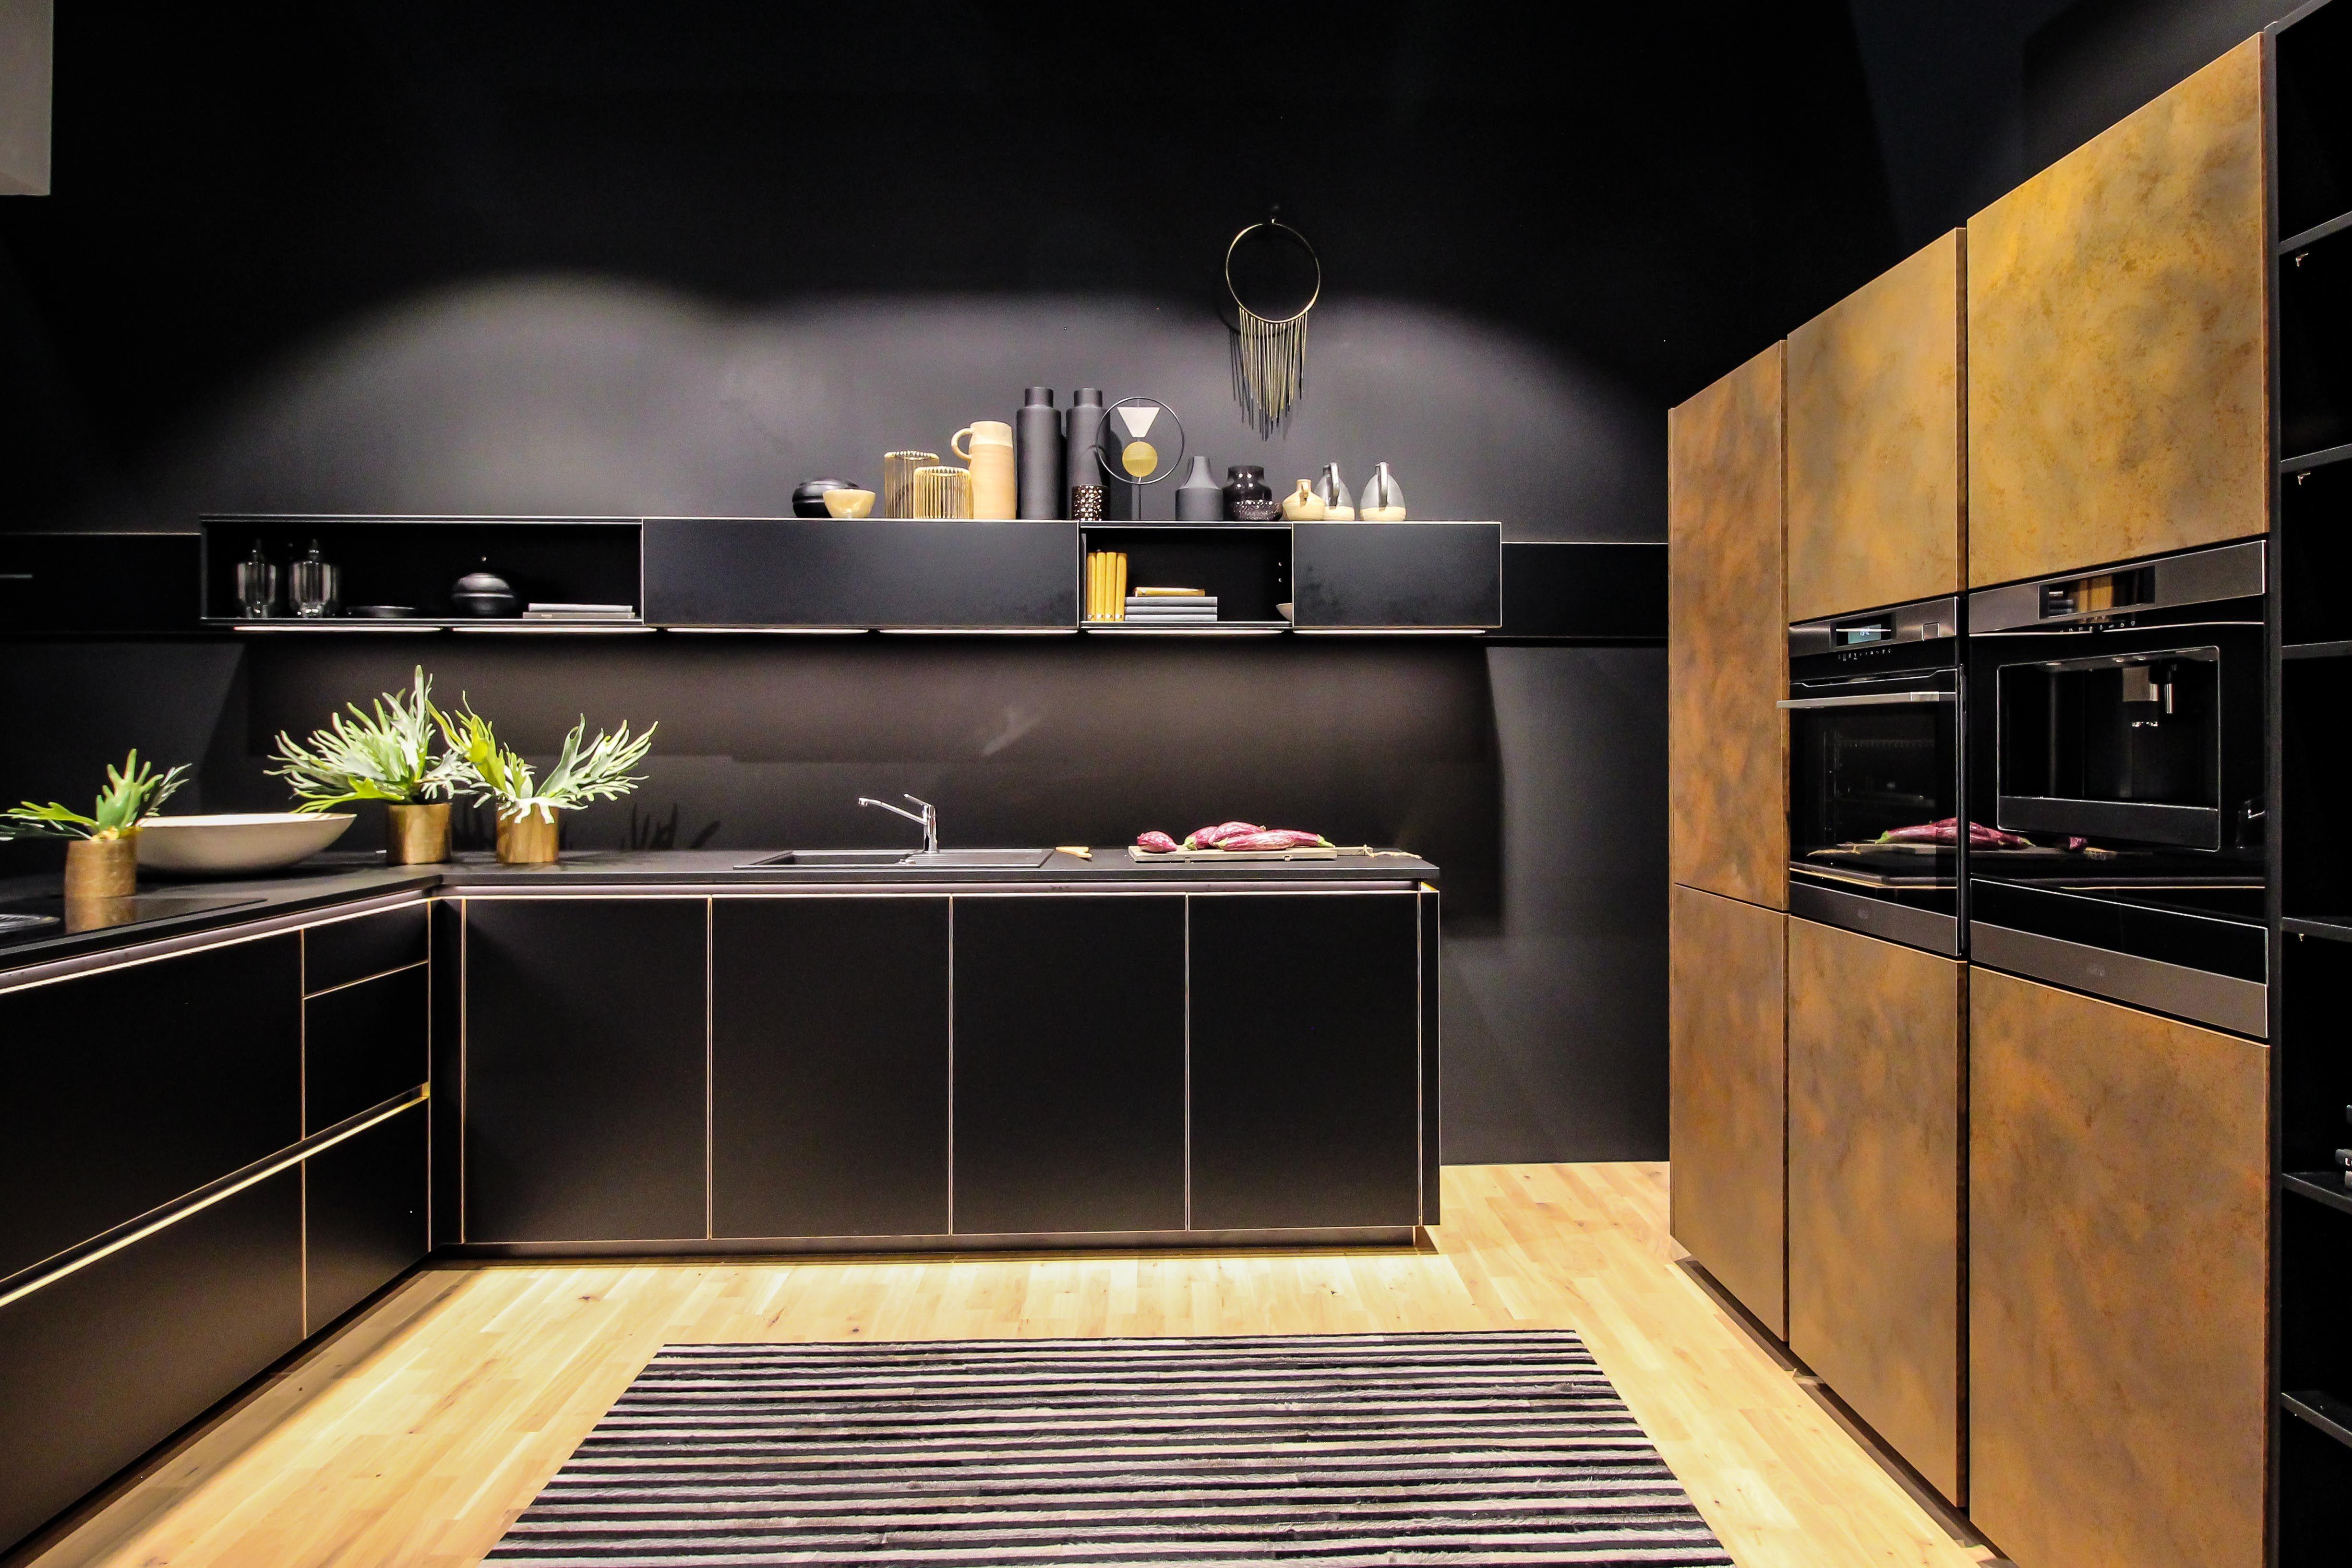 Black kitchen inspiration from Milan Design Week 2019